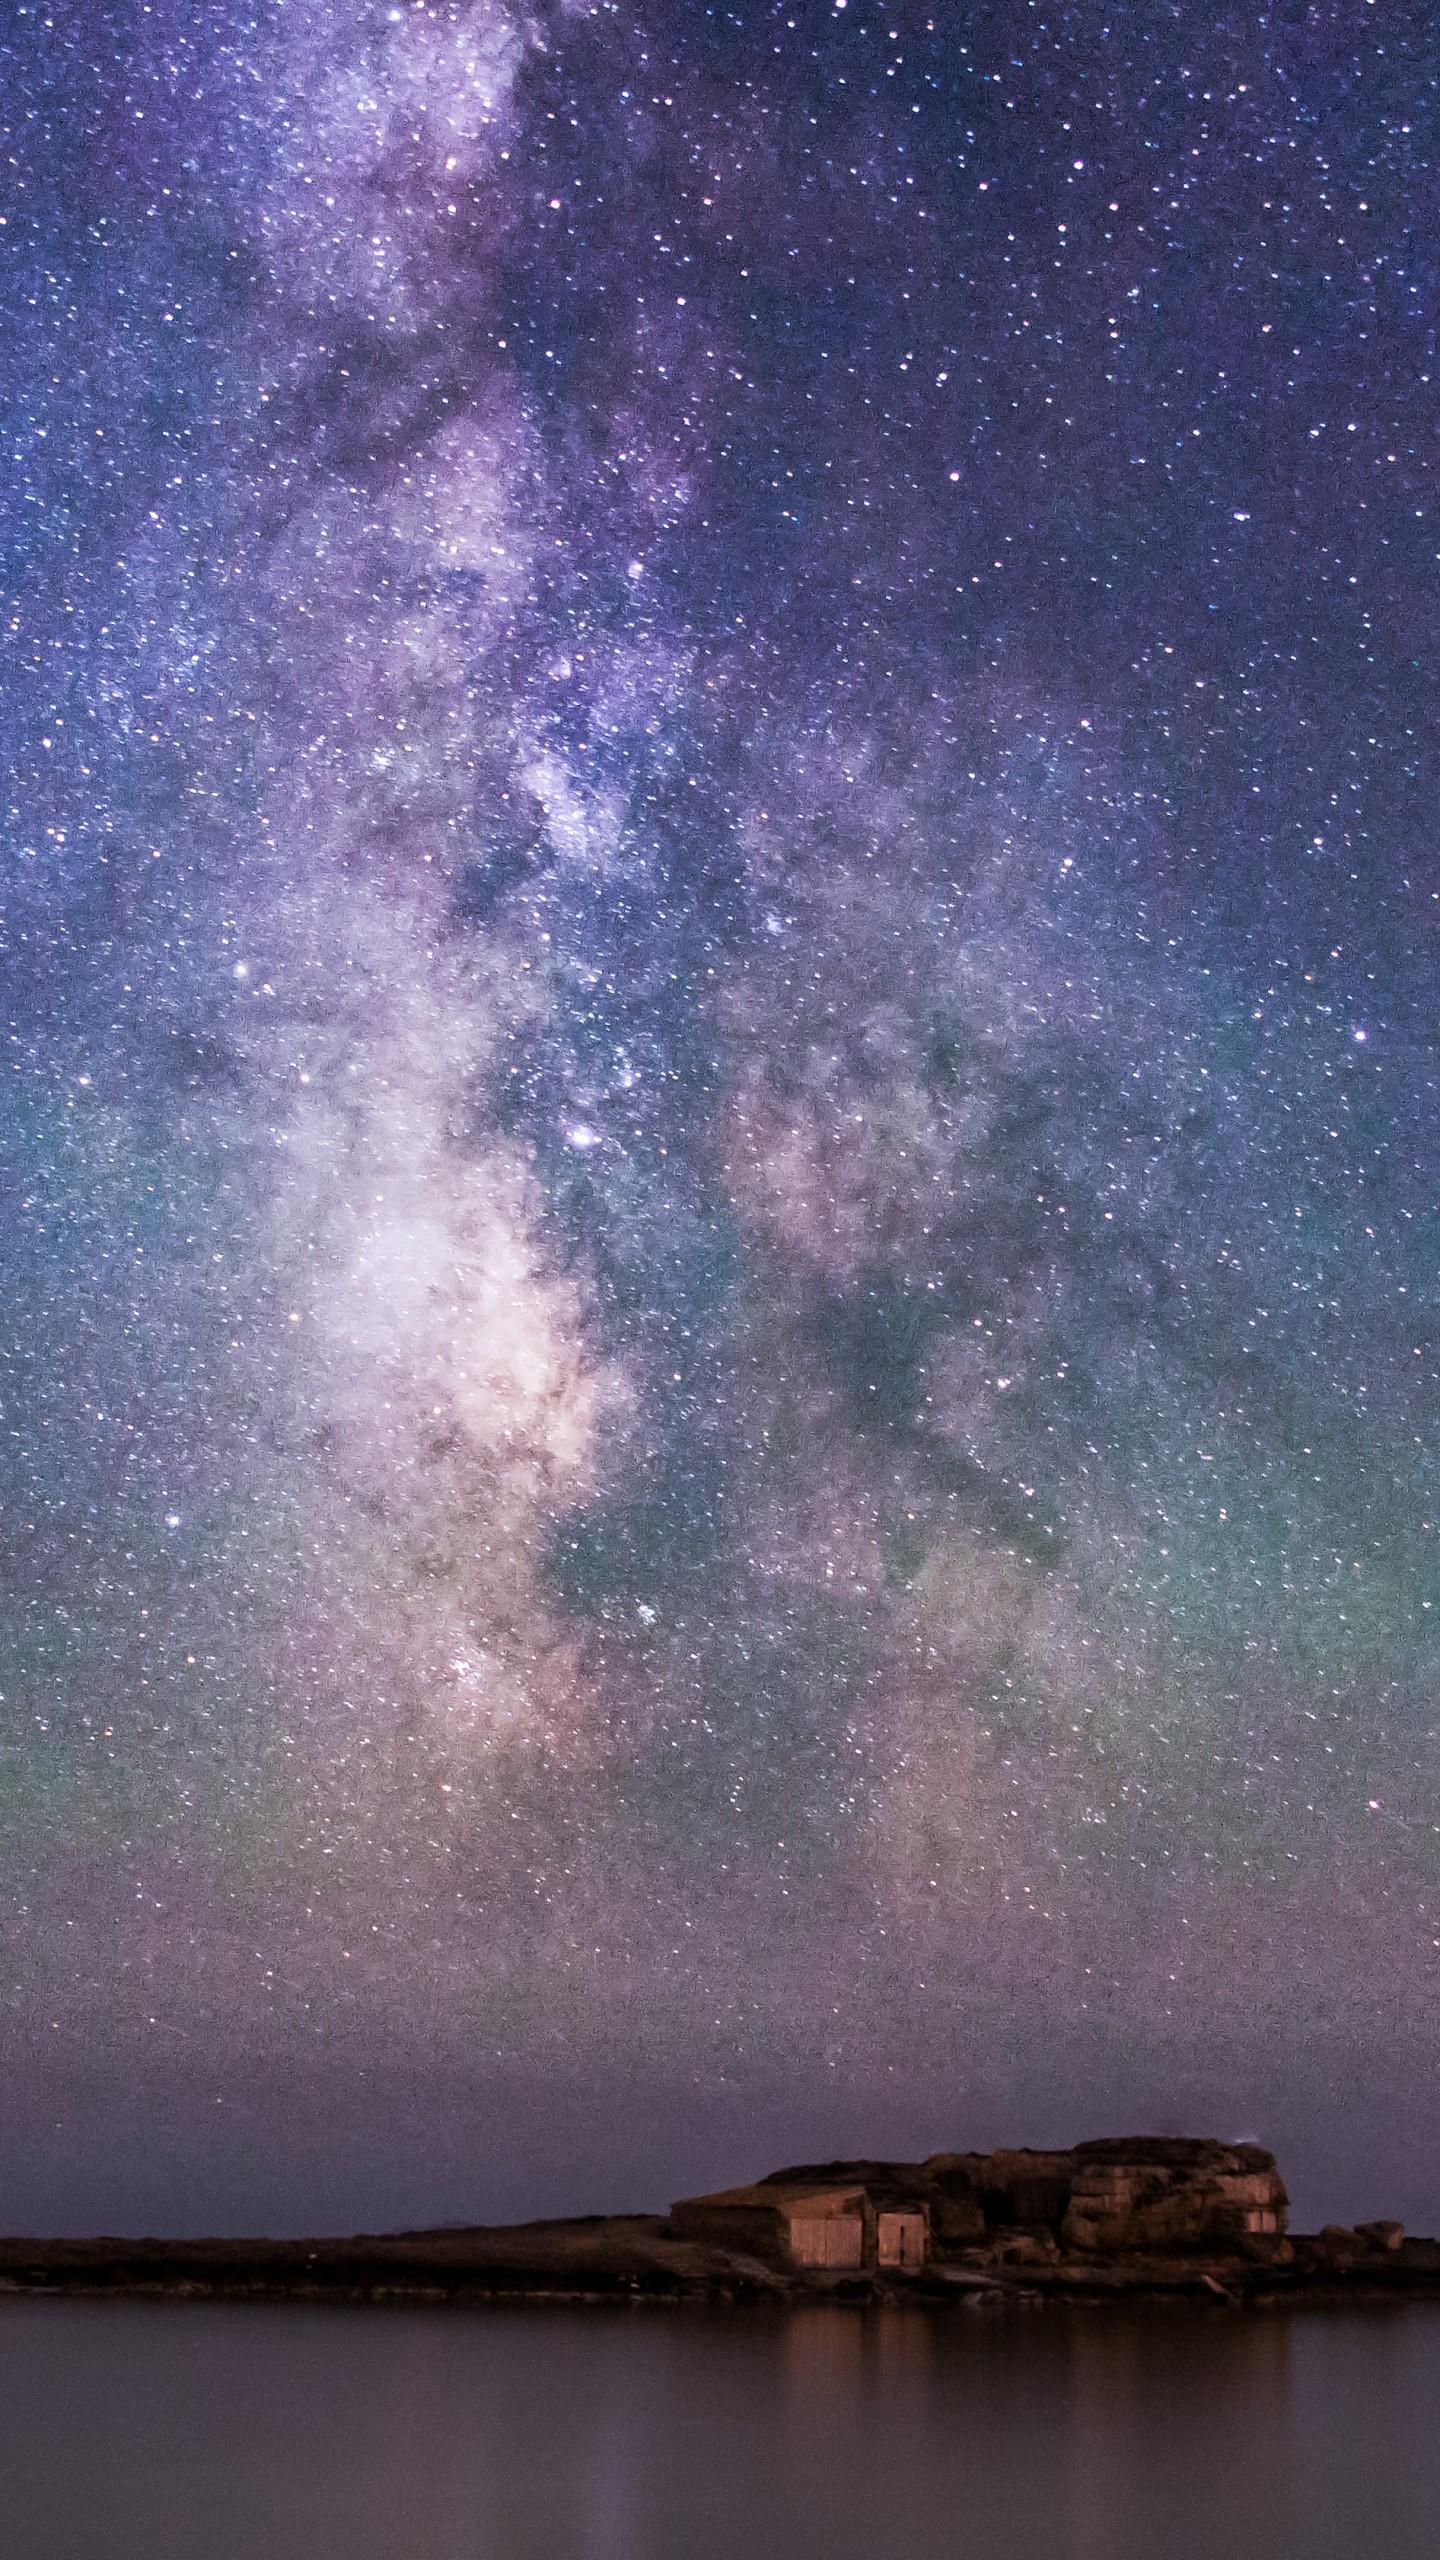 Wallpaper Iceland, 4k, 5k wallpaper, 8k, night, sky, stars ...